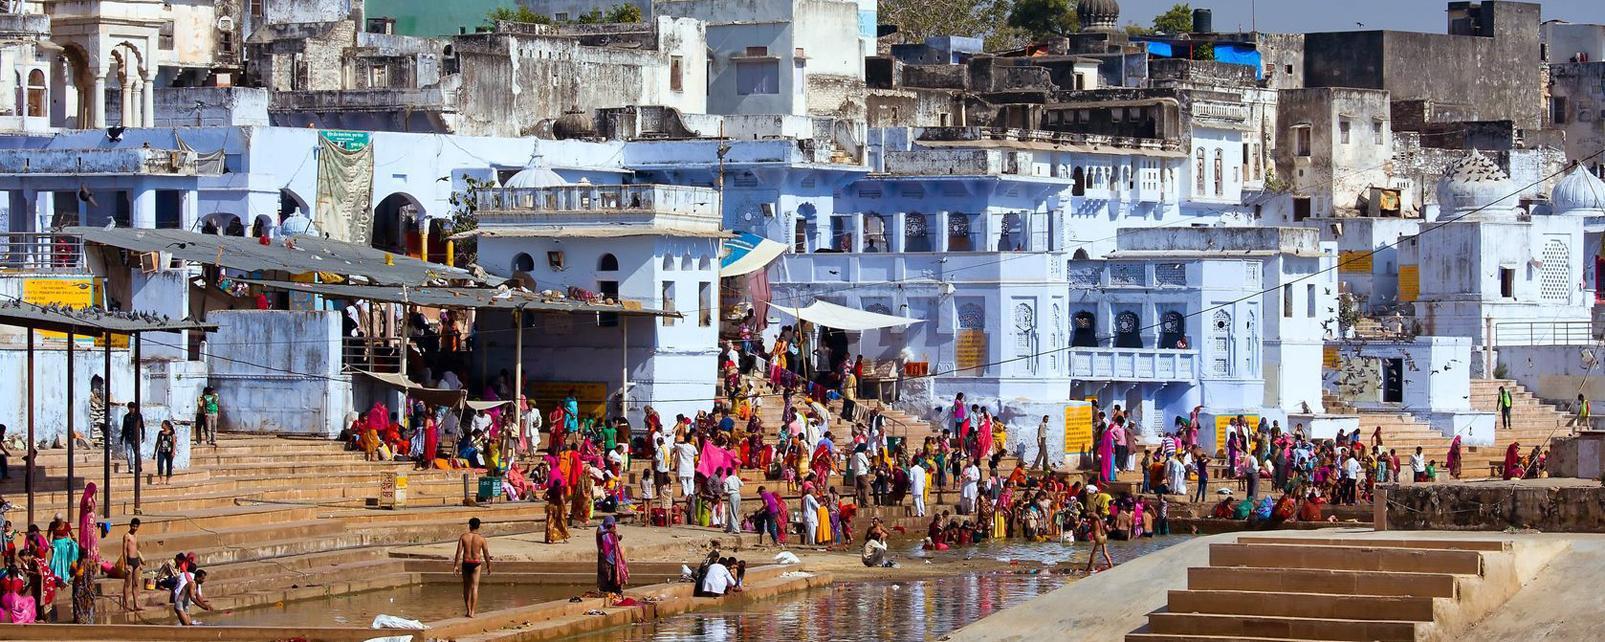 Asie; Inde; Rajasthan; Pushkar;